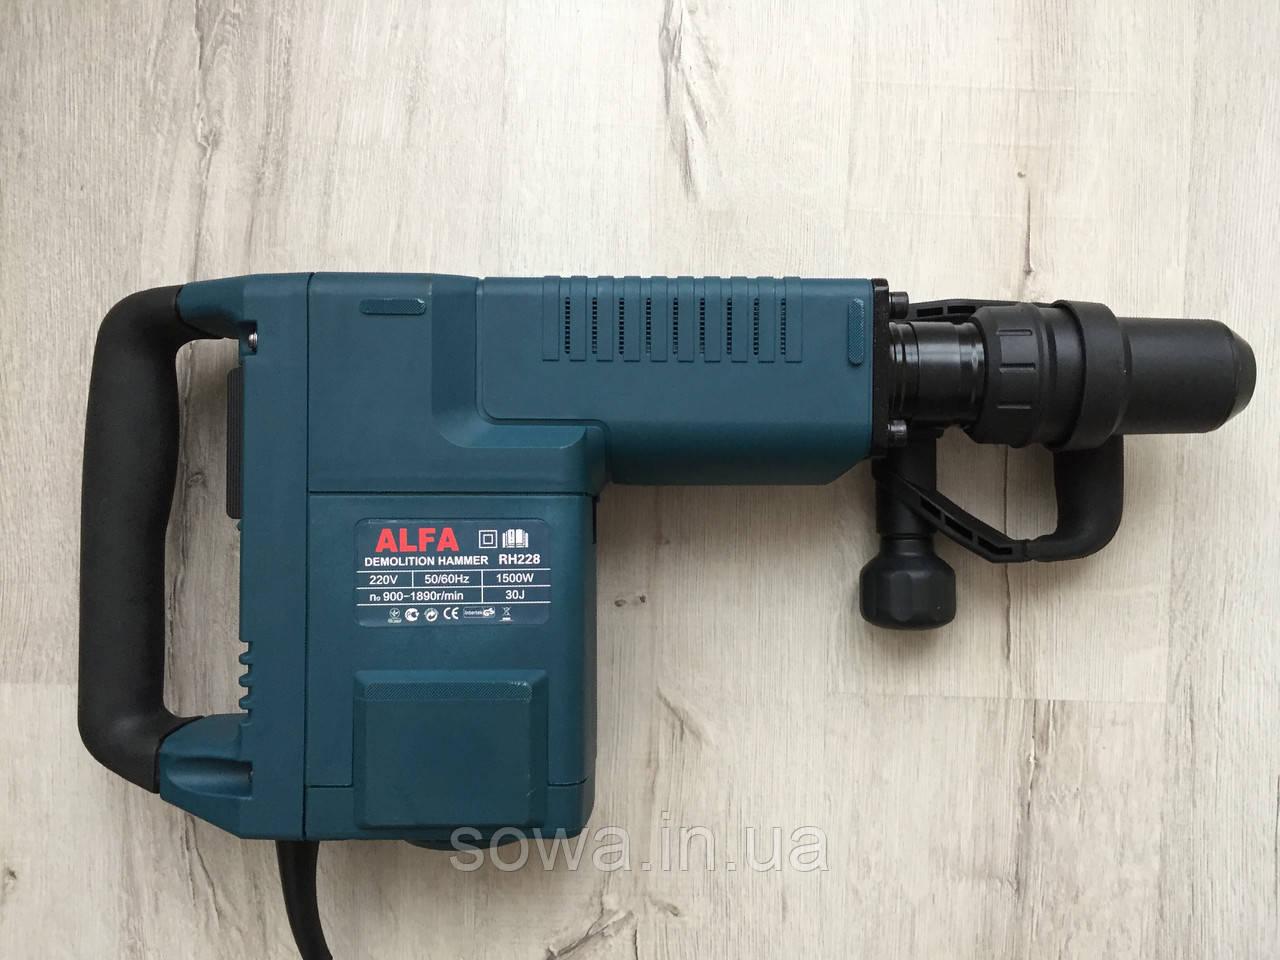 ✔️ Электрический отбойник AL-FA RH228